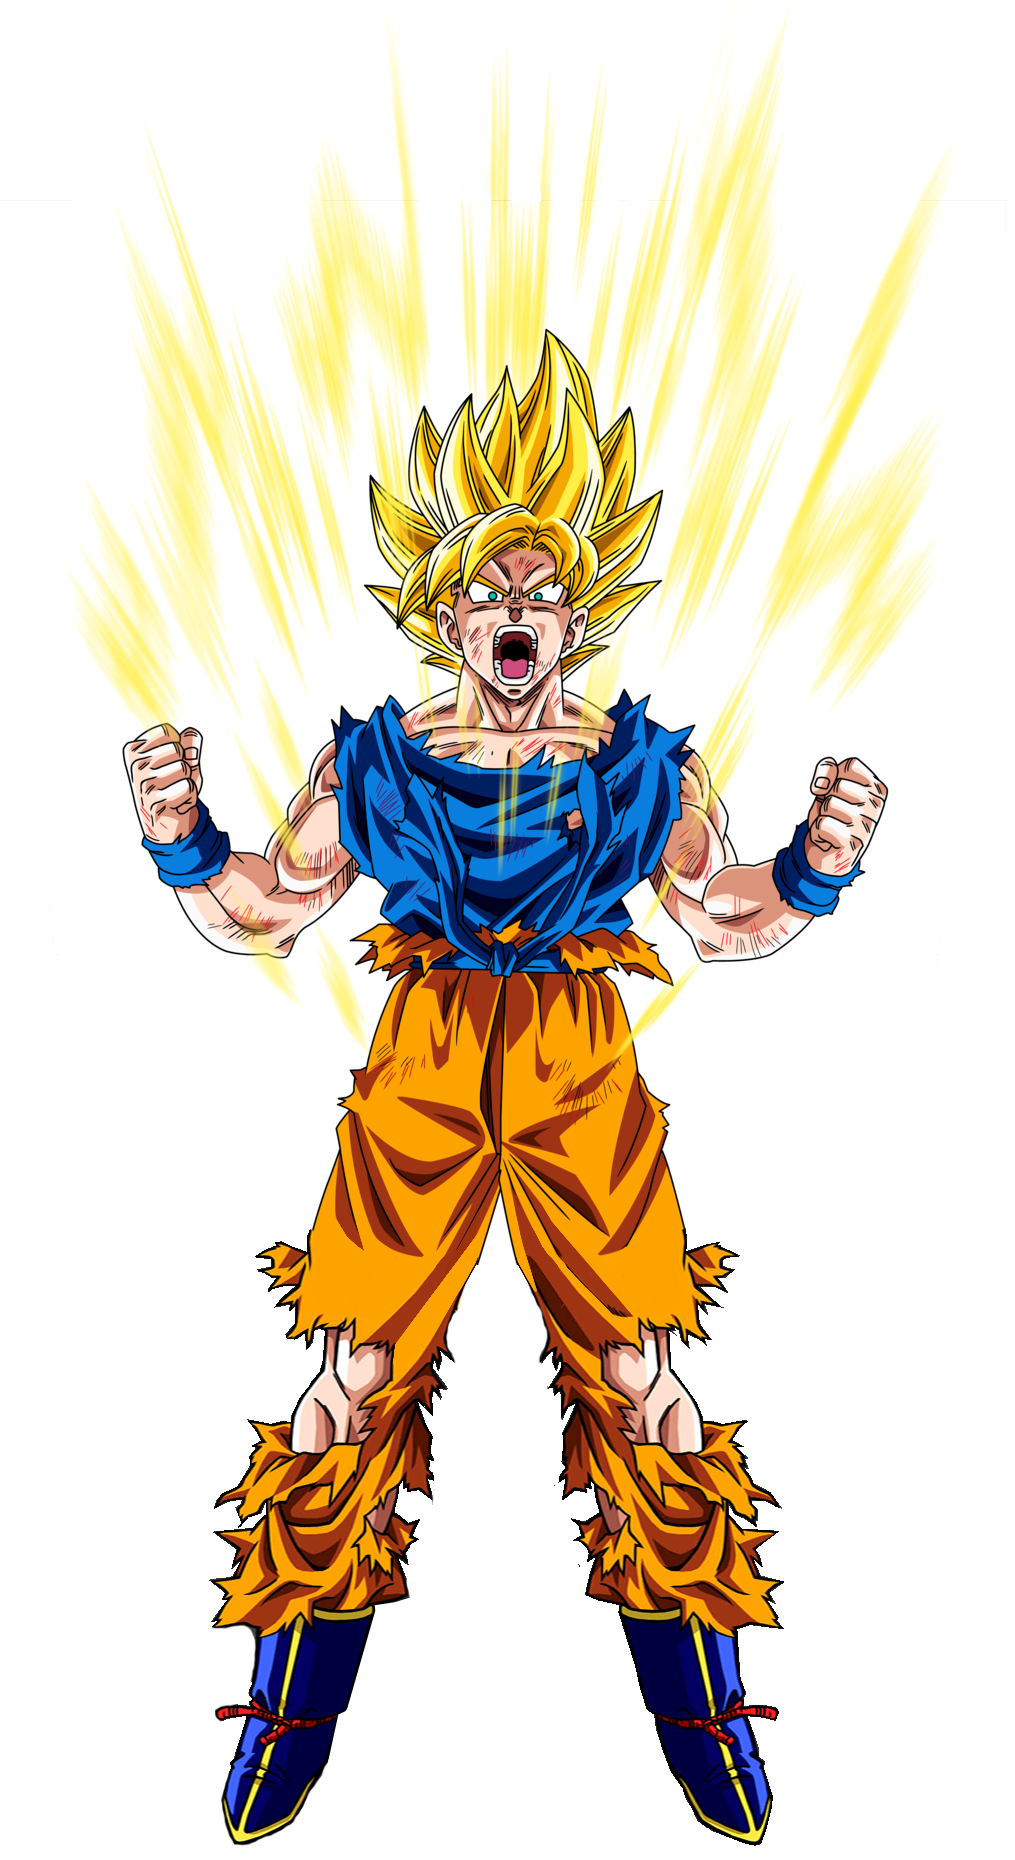 Goku Ssj 1 by elninja75 on DeviantArt